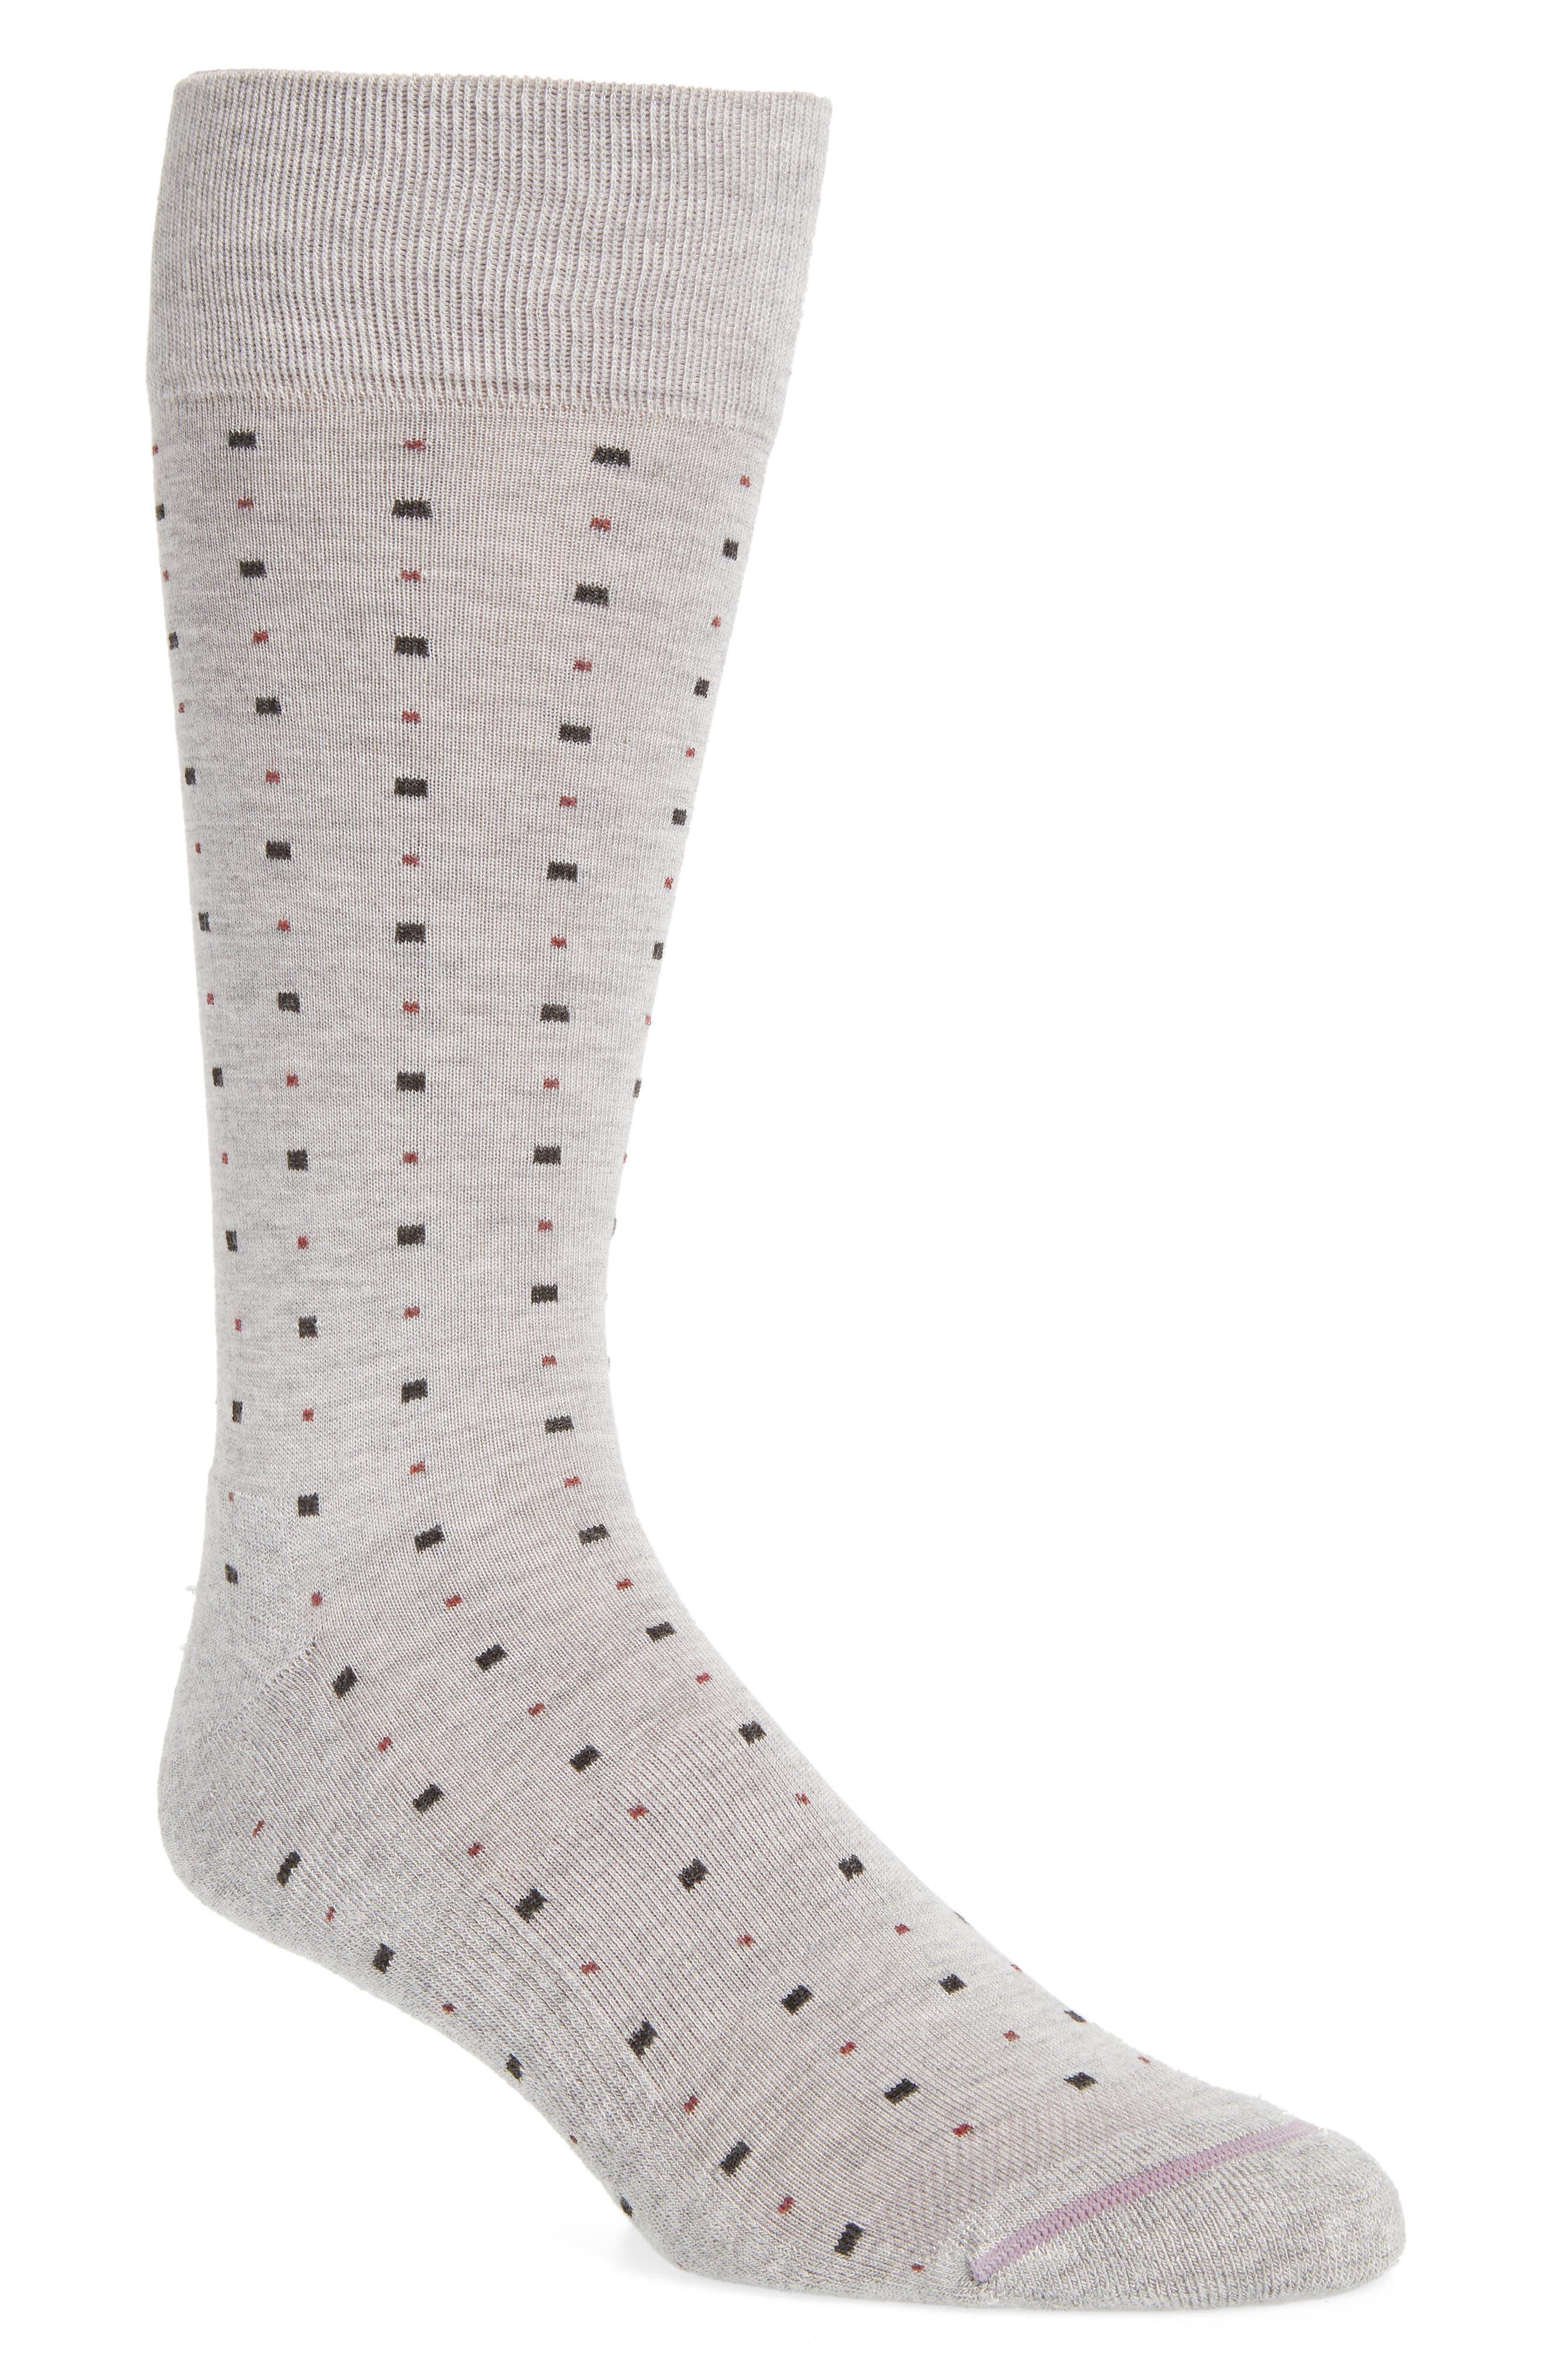 Main Image - Nordstrom Men's Shop Box Dot Crew Socks (3 for $30)